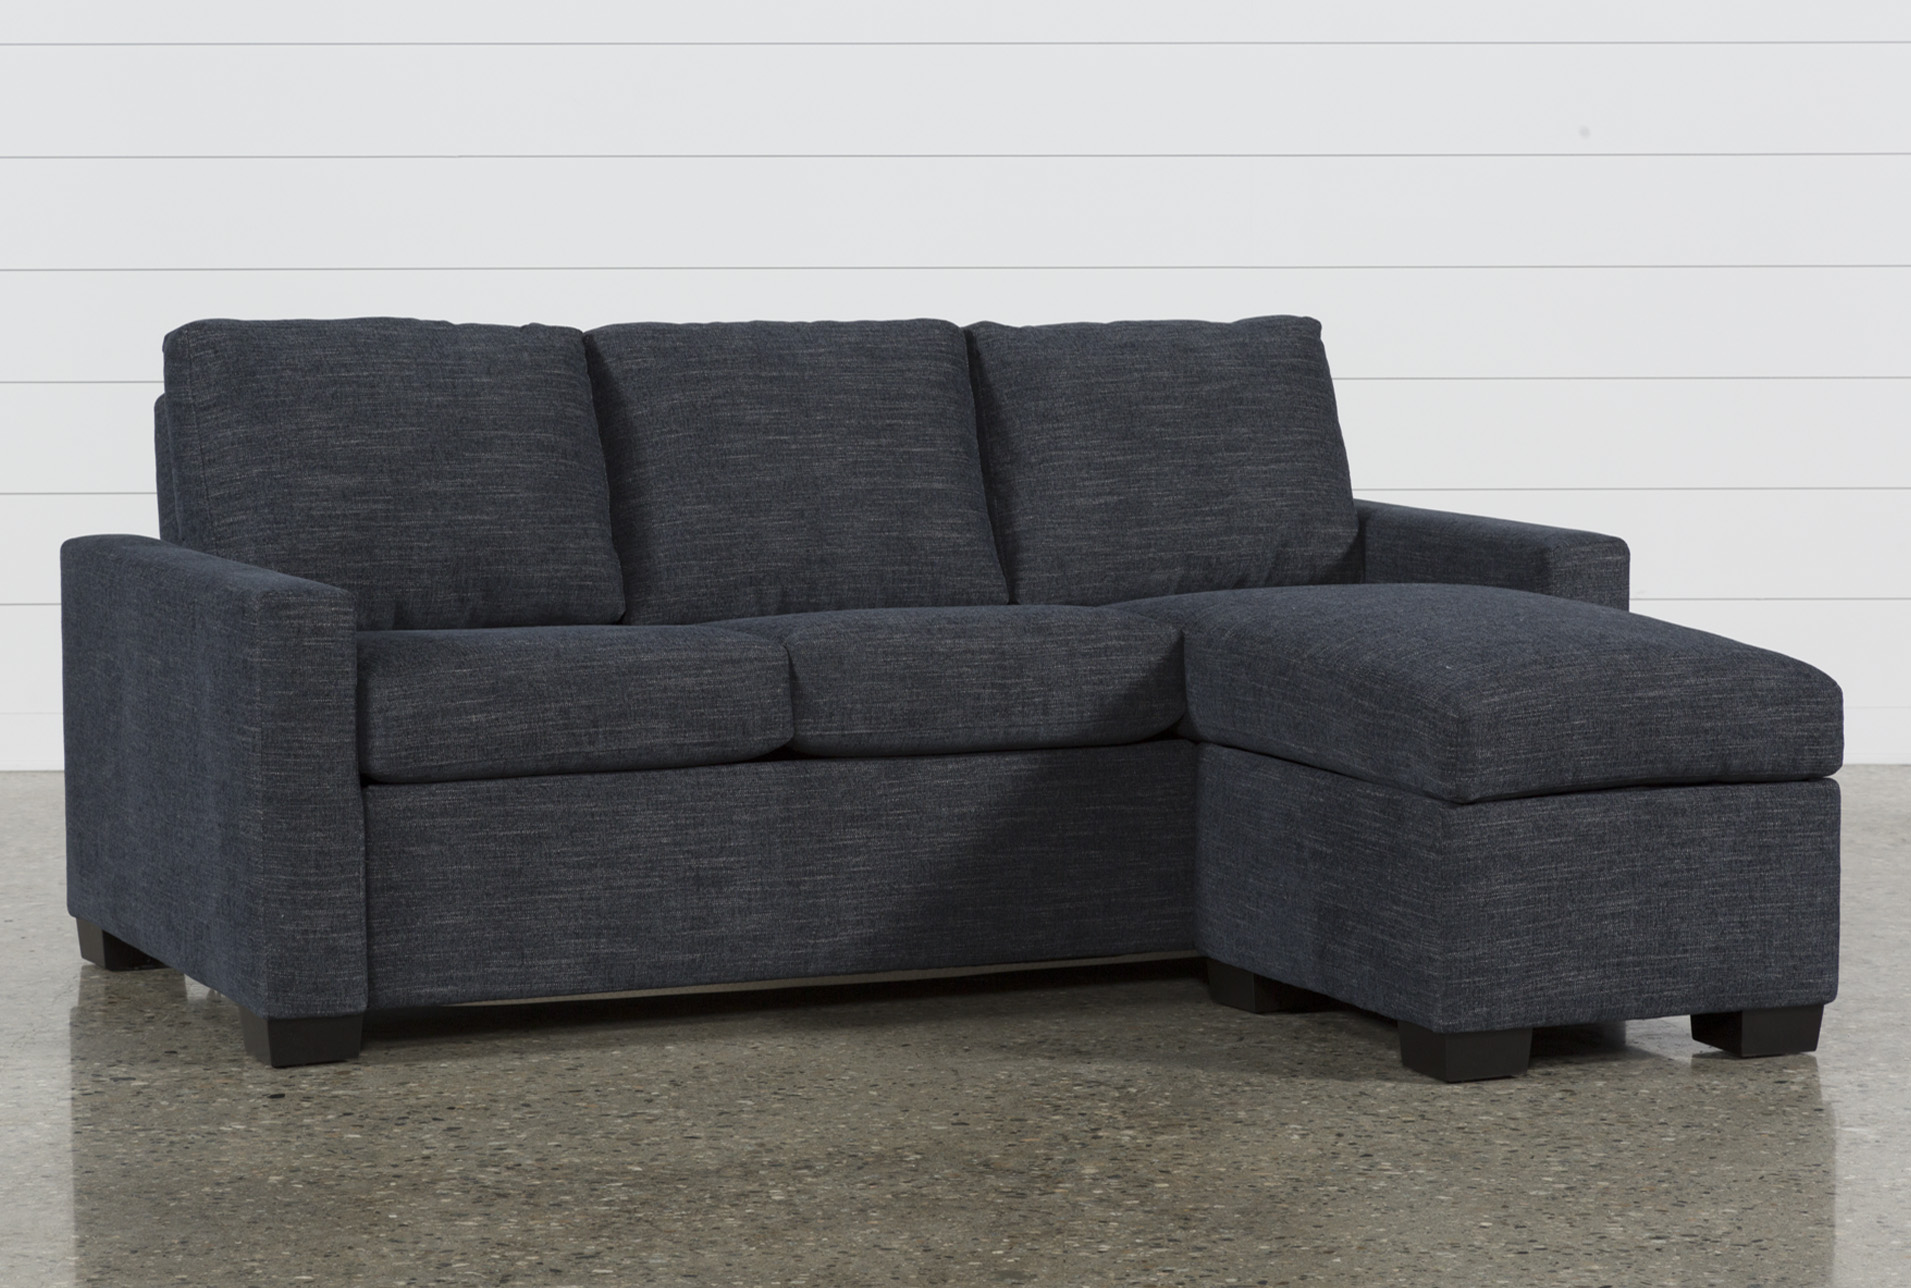 Queen sleeper sofa Mackenzie Denim Queen plus sleeper sofa with storage space GBXBQYH